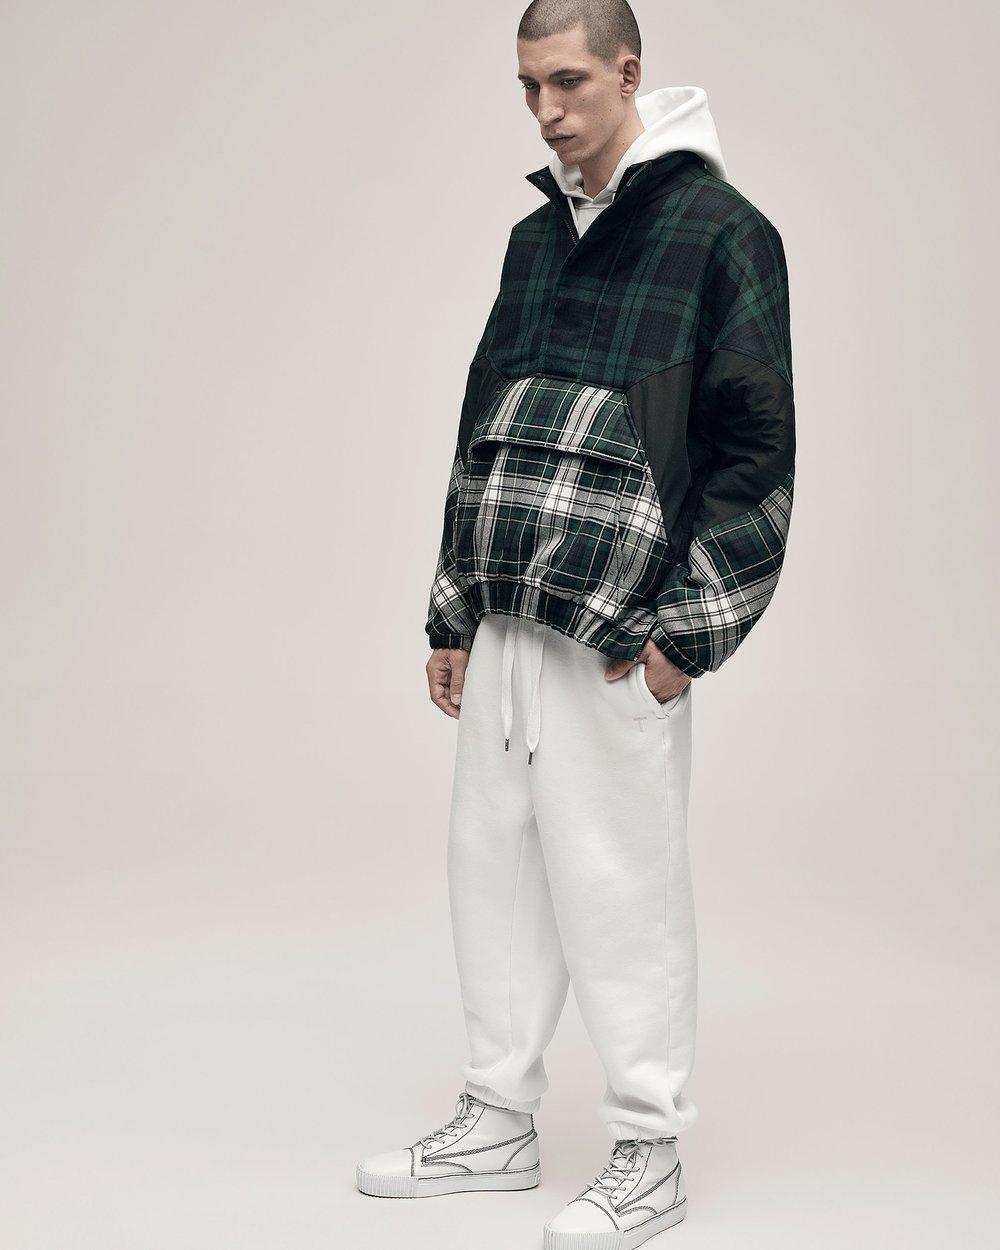 Alexander Wang Spring 2017 MenswearAlexander Wang Spring 2017 Menswear